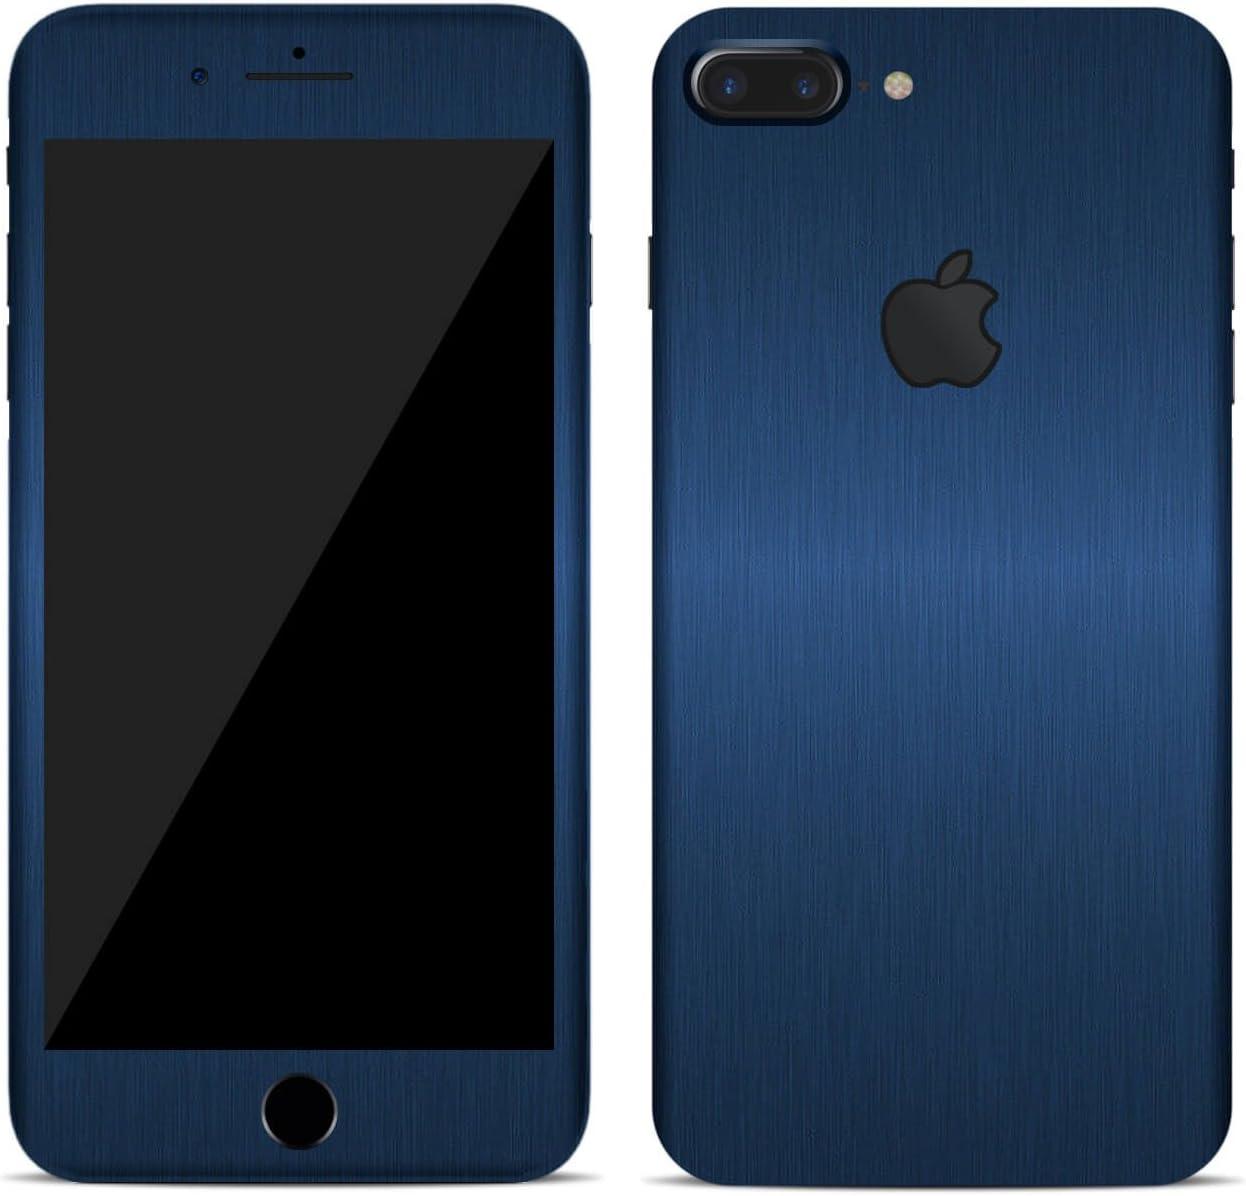 iphone 7, matt pink Textured skin sticker for iPhone 7 /& 7 plus Full Body Wrap